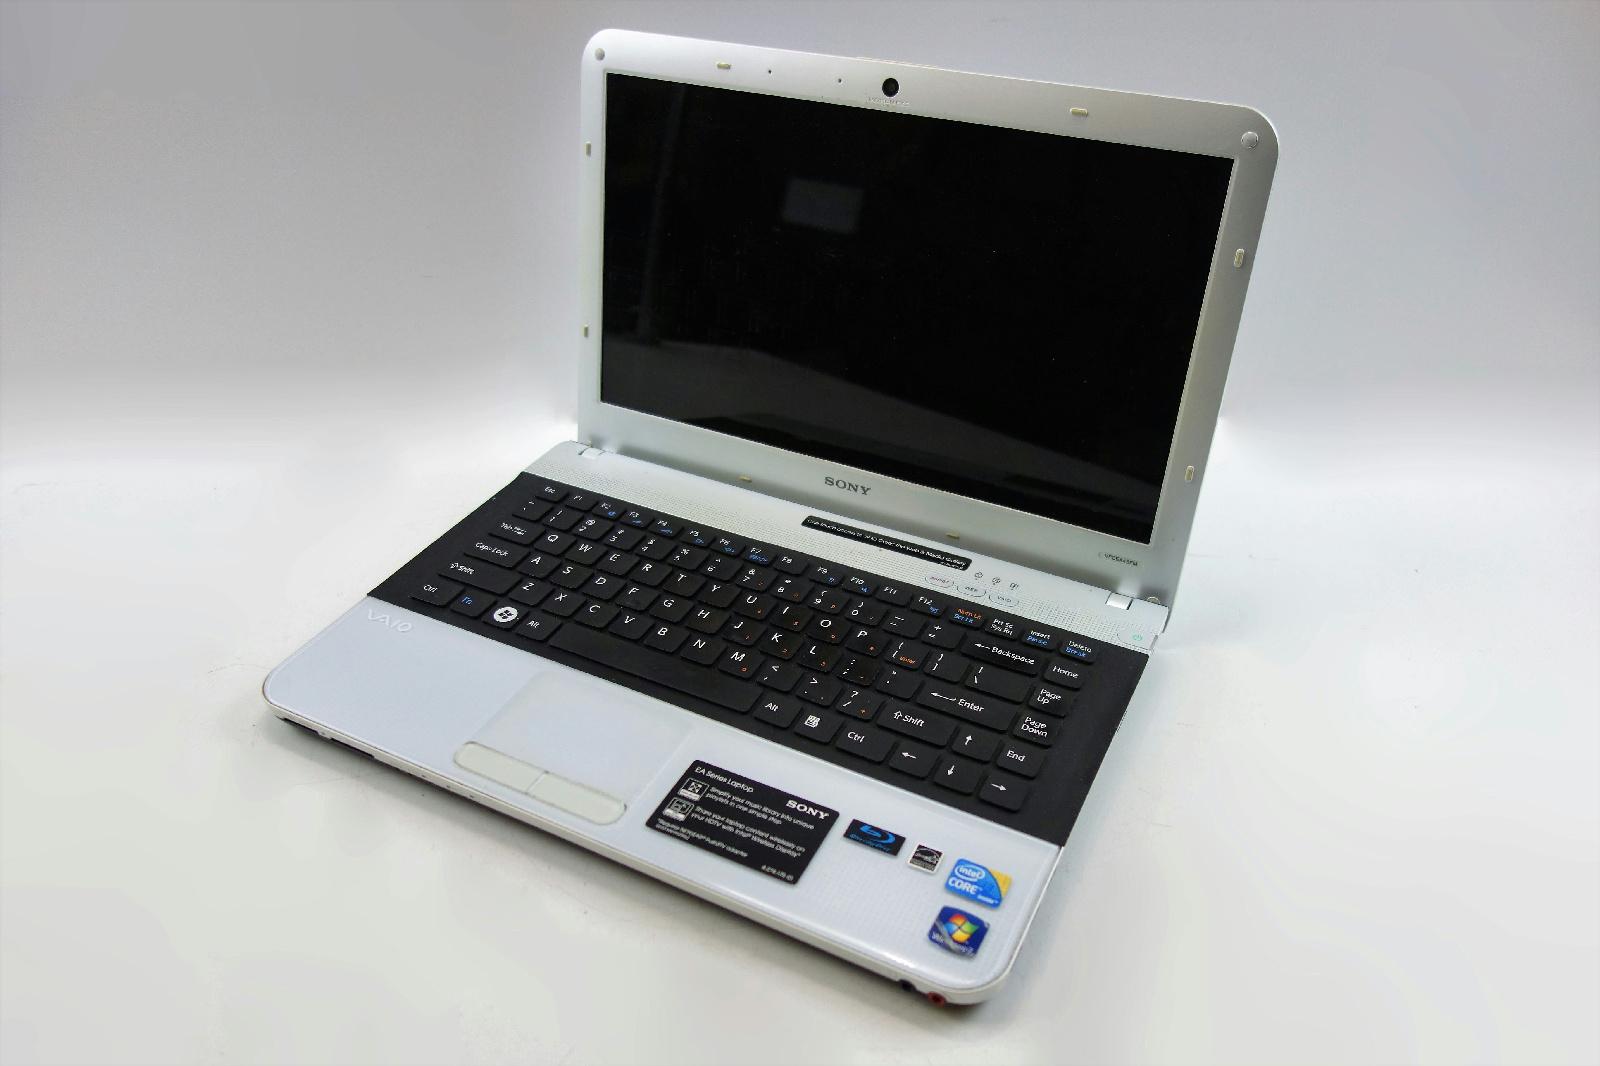 Sony Vaio Pcg 61317l Laptop Intel Core I3 4gb Ram No Hdd